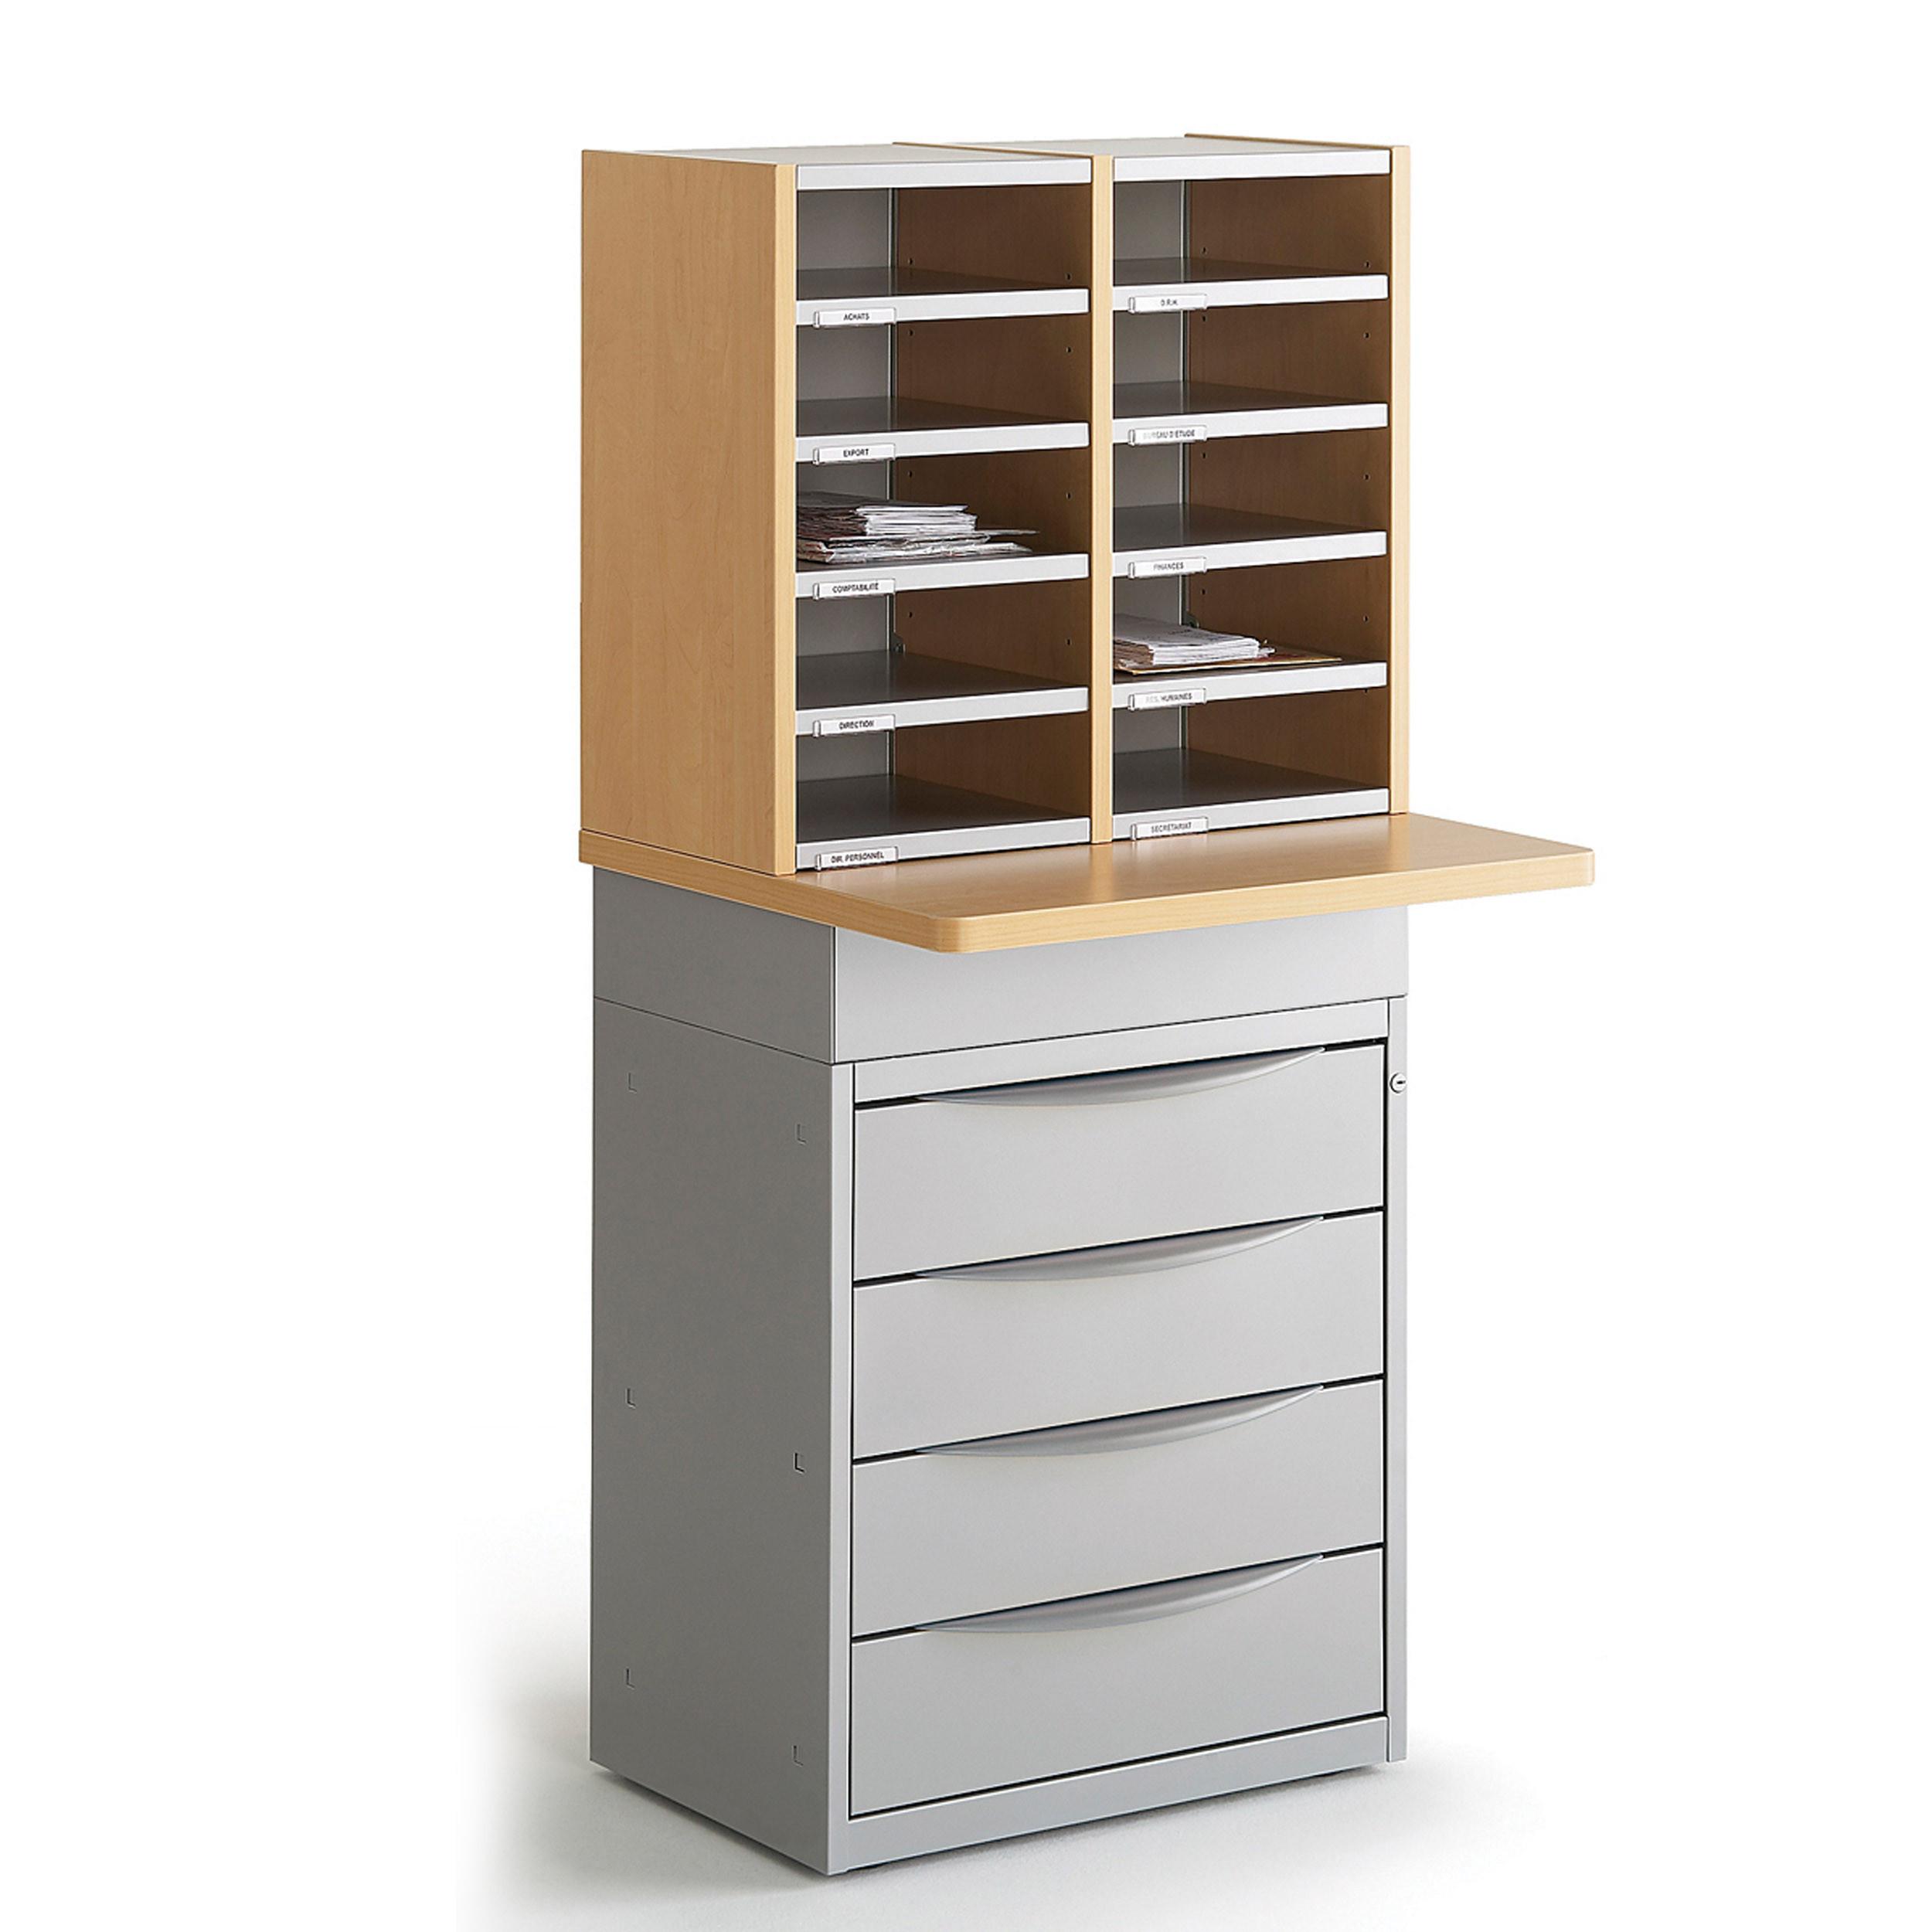 Trimod Postal Room Furniture